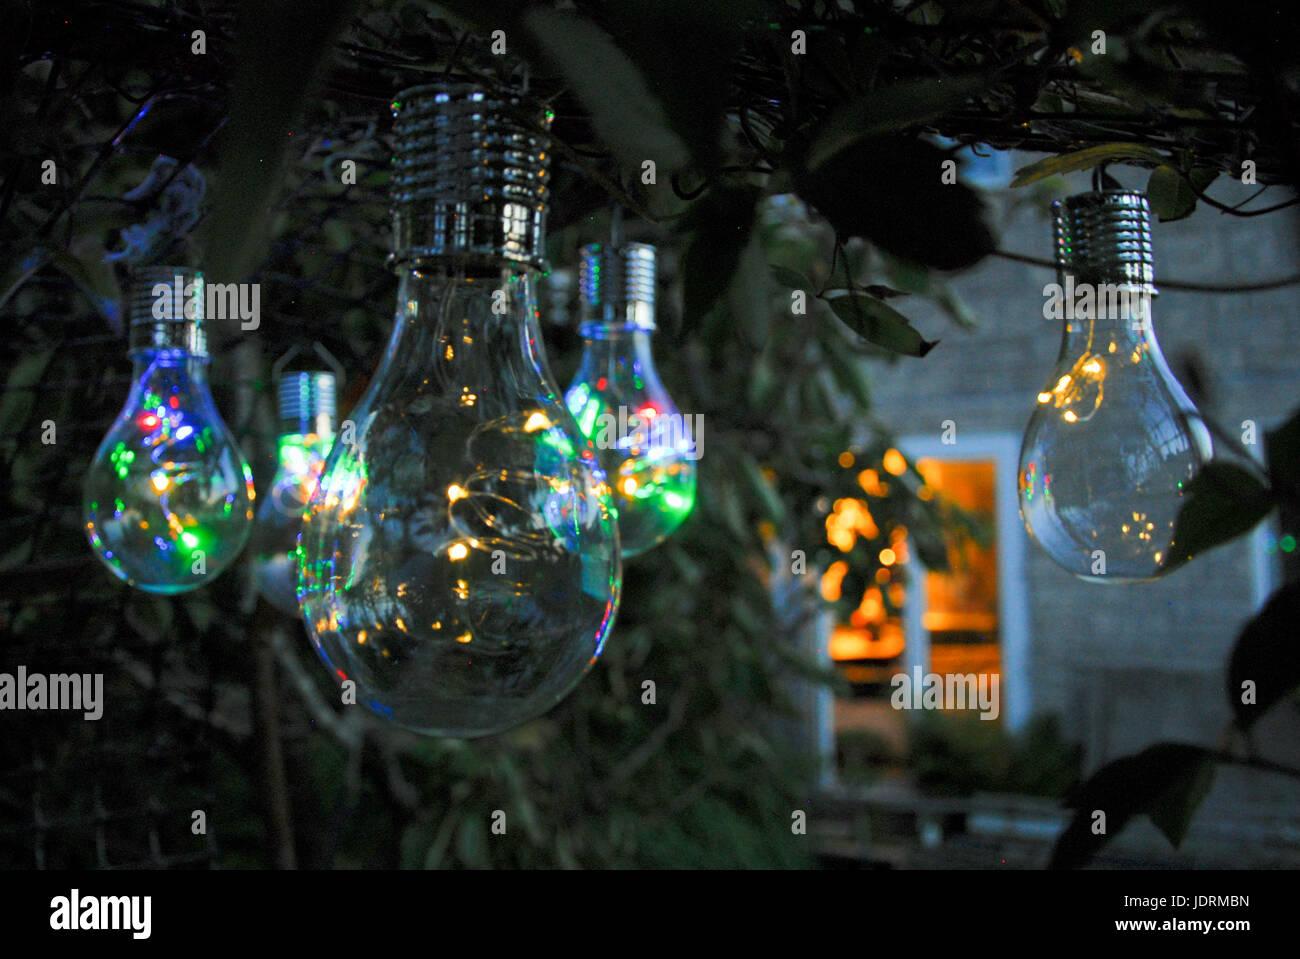 Solar-powered garden lanterns light up as night falls on the Isle of Portland - Stock Image